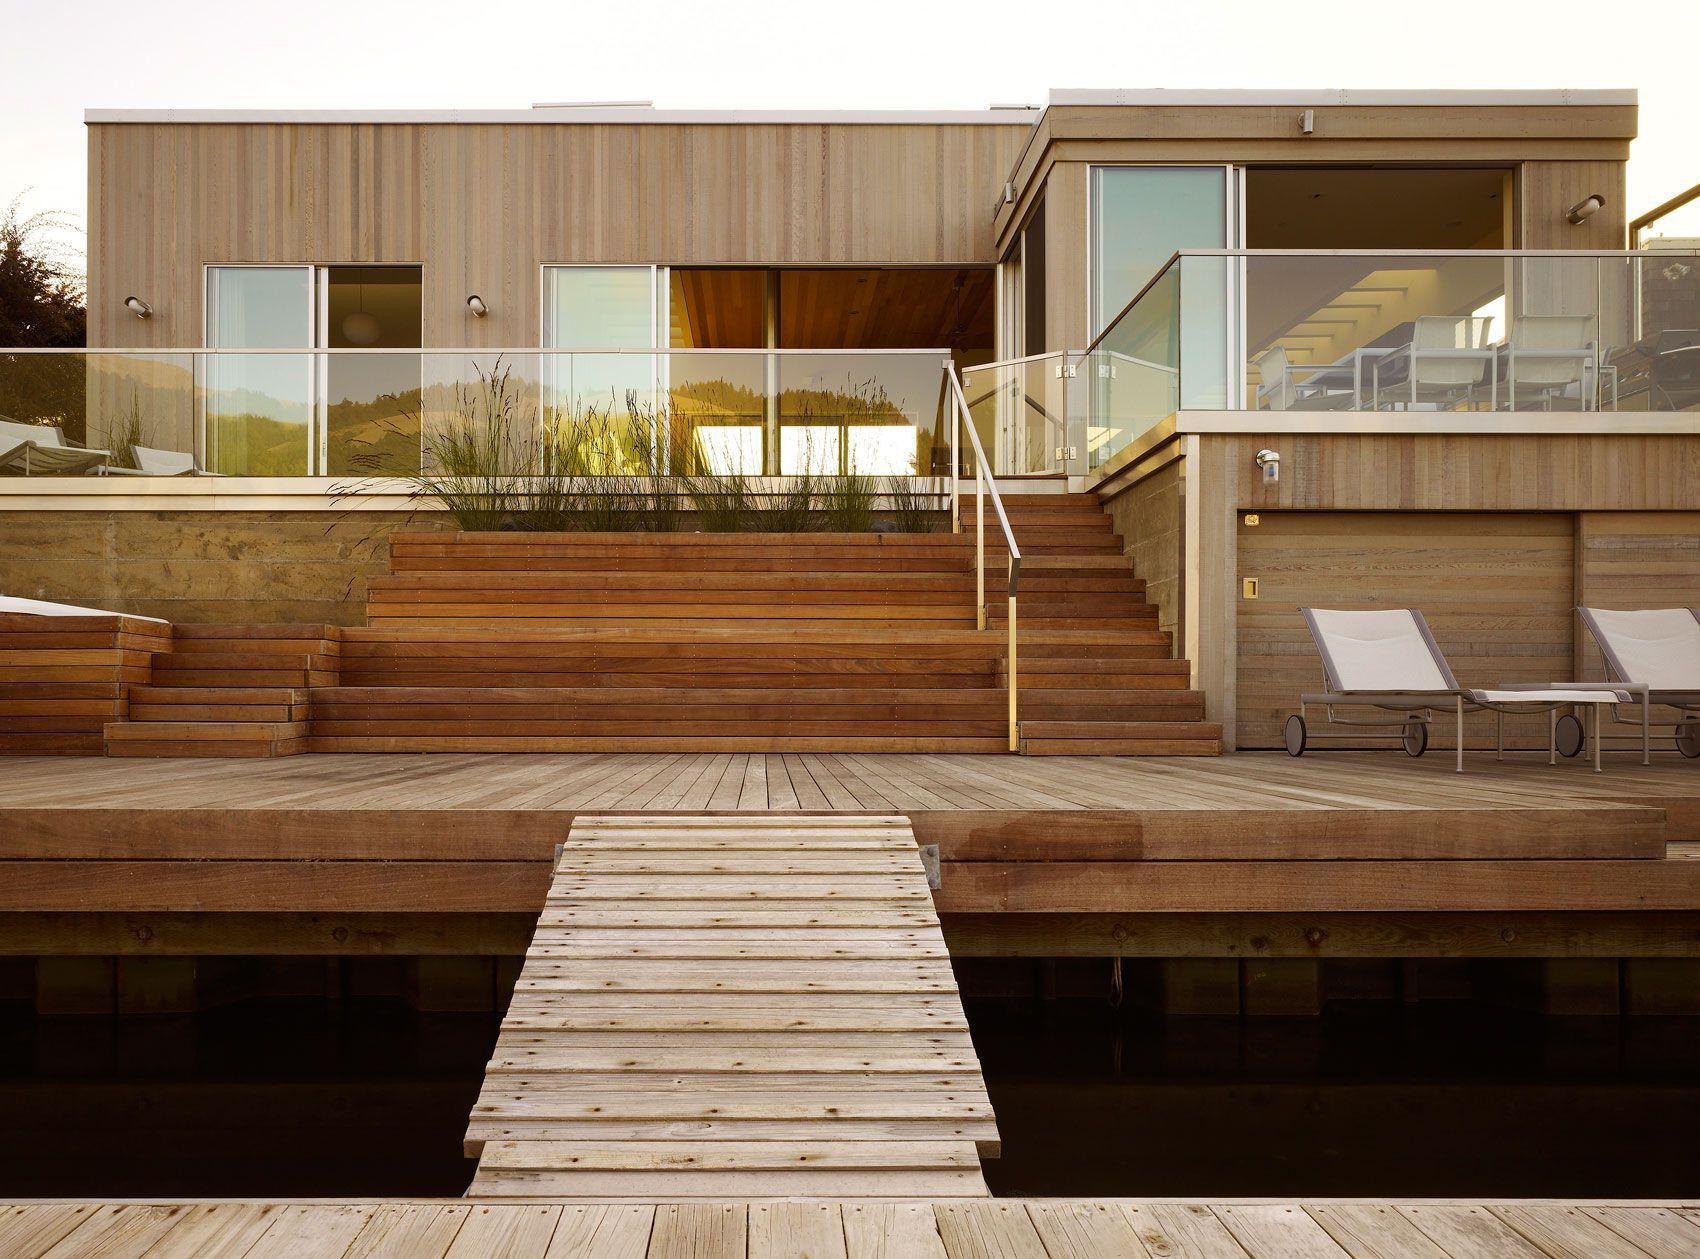 Stinson Beach House by Butler Armsden Architects in